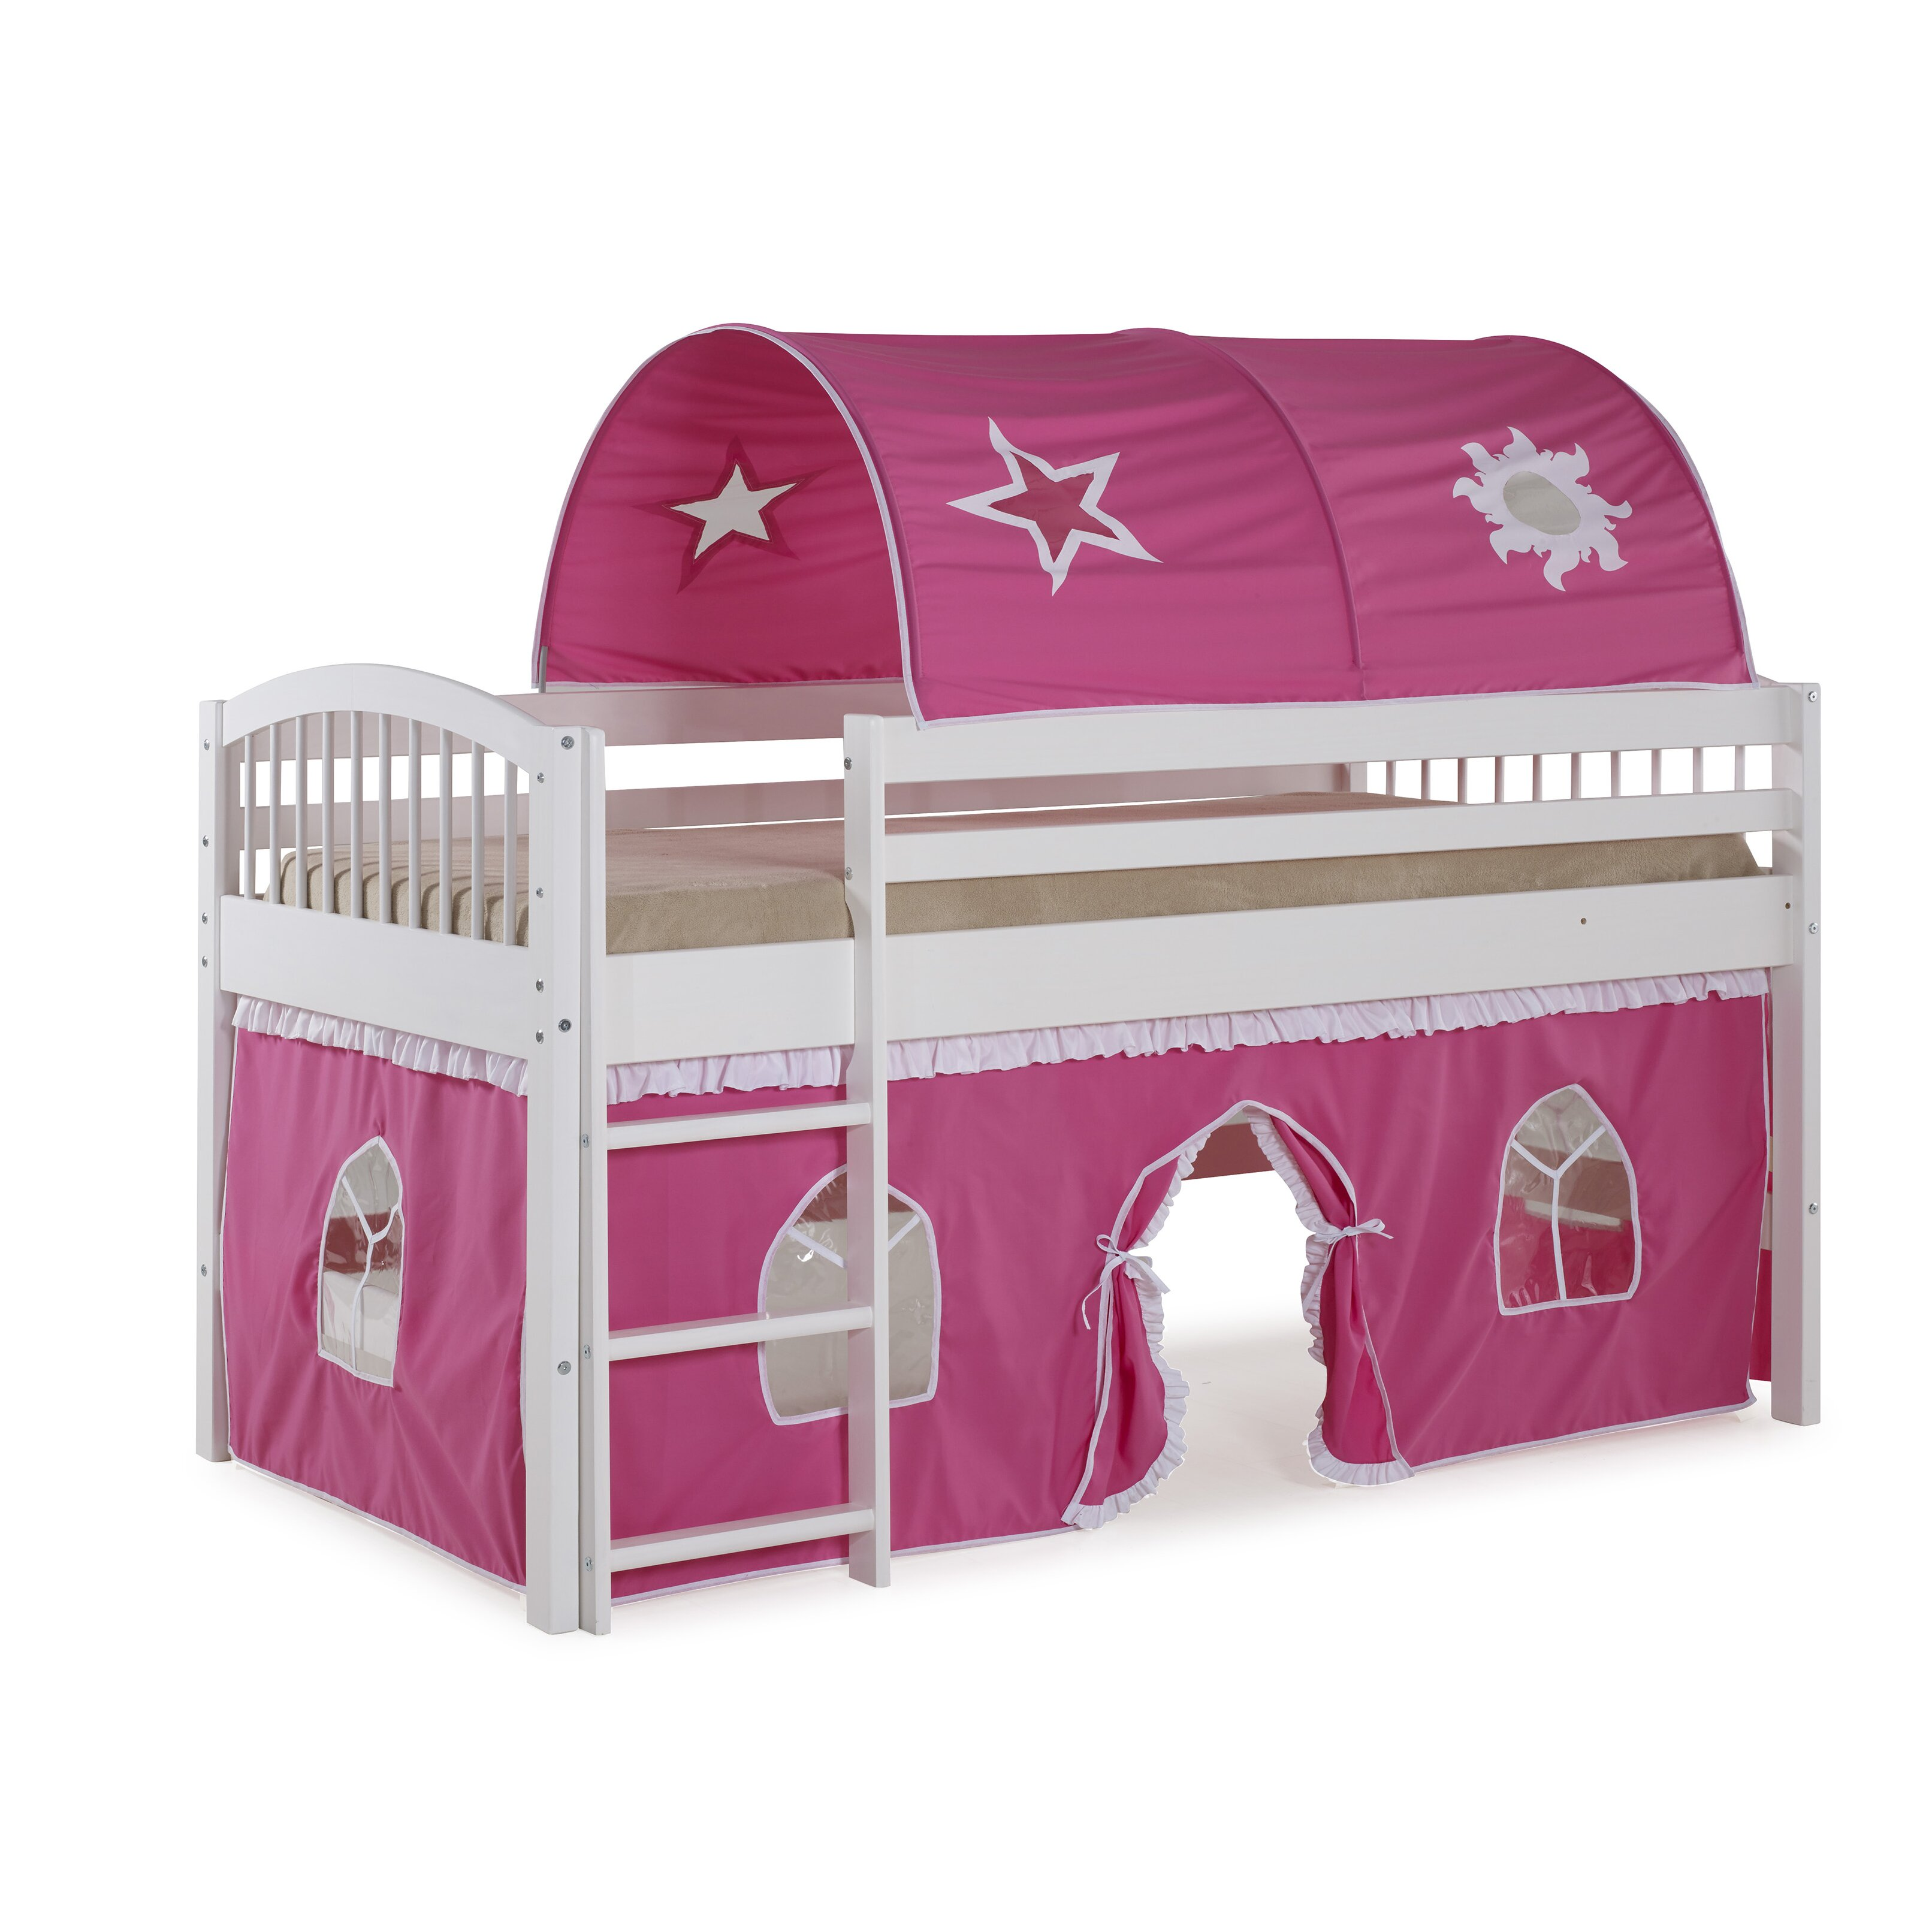 Step2 princess palace twin bed car interior design - Twin Bed